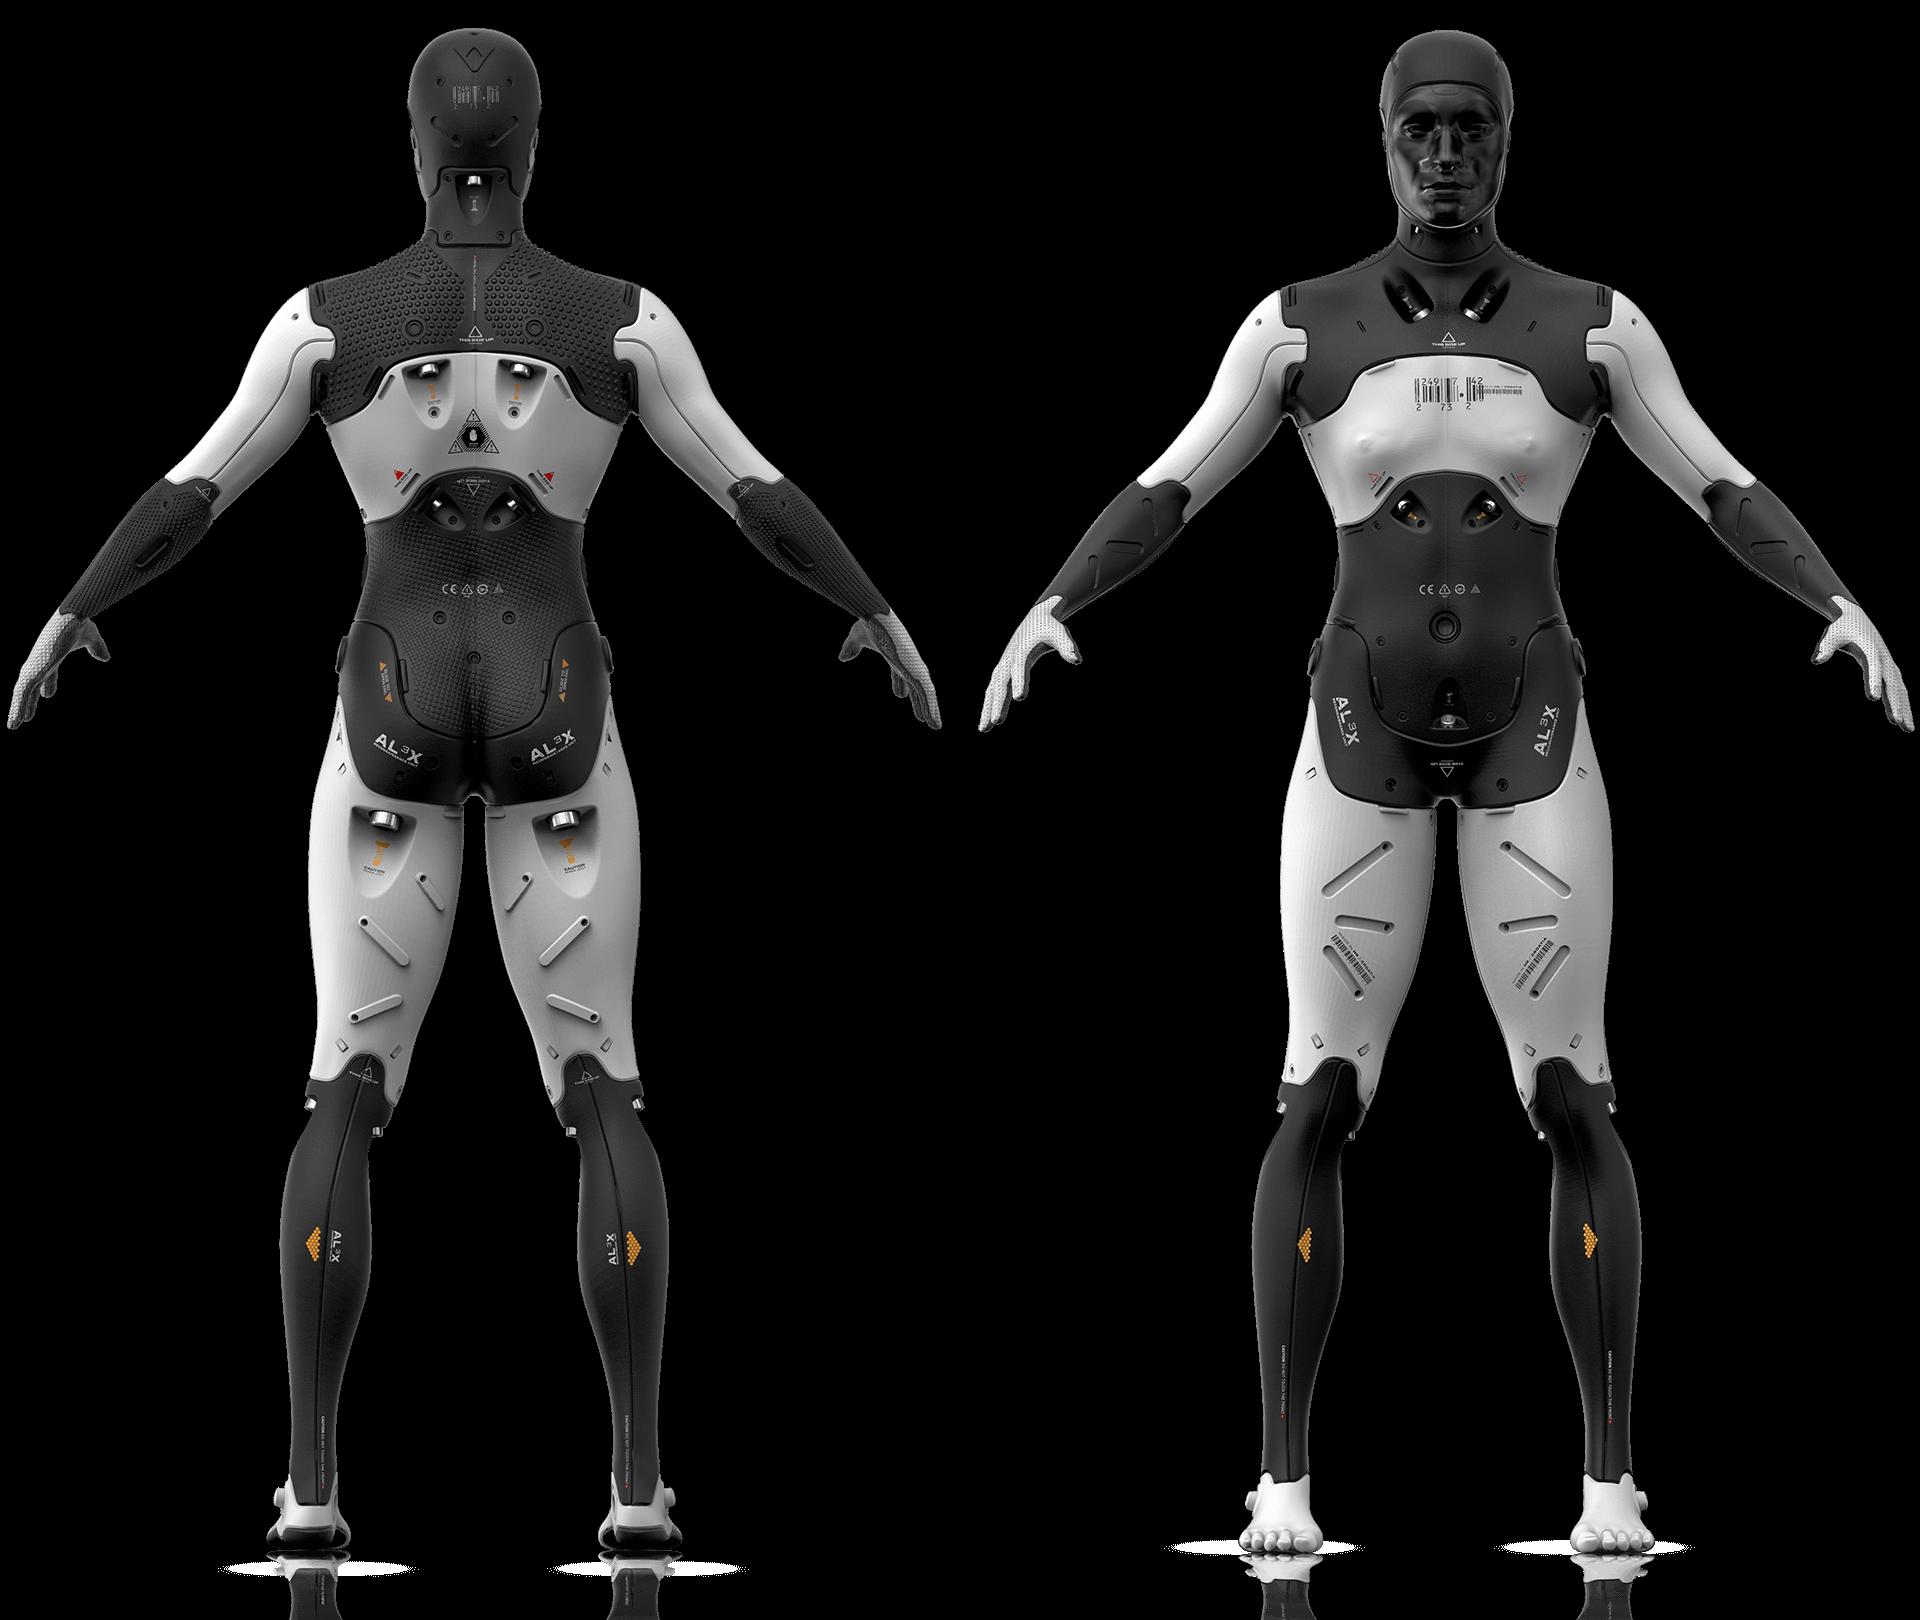 Roboto-a06.1315-Dual-Alpha